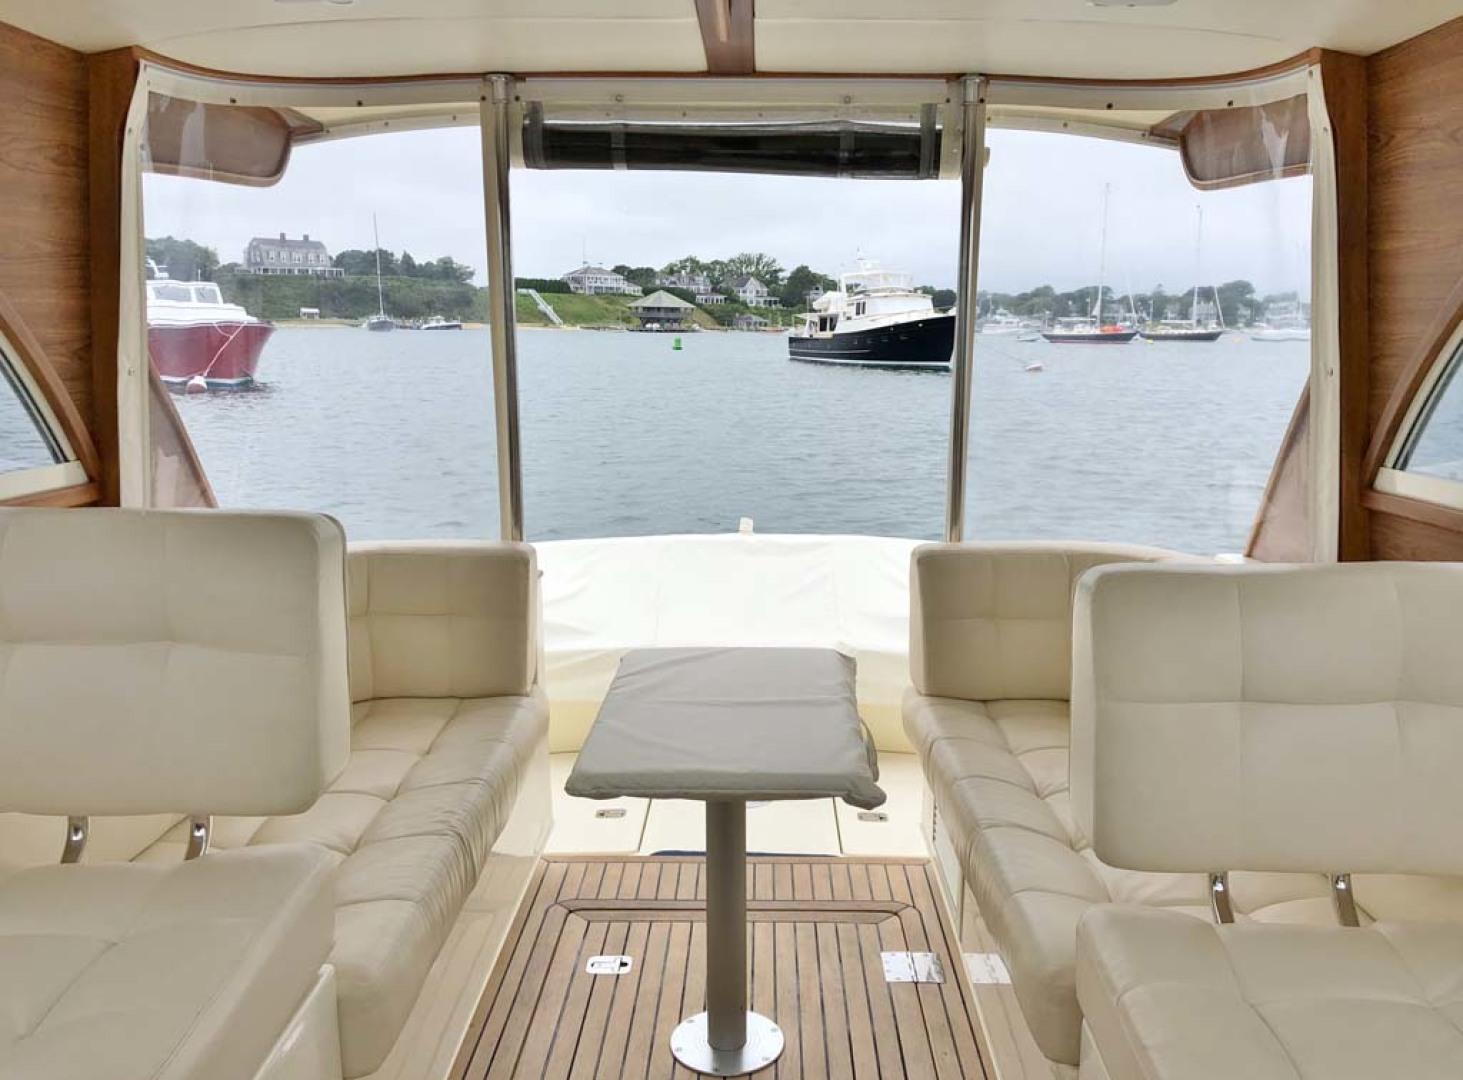 Legacy Yachts-Hardtop Express 2008 -Falmouth-Massachusetts-United States-1059106 | Thumbnail